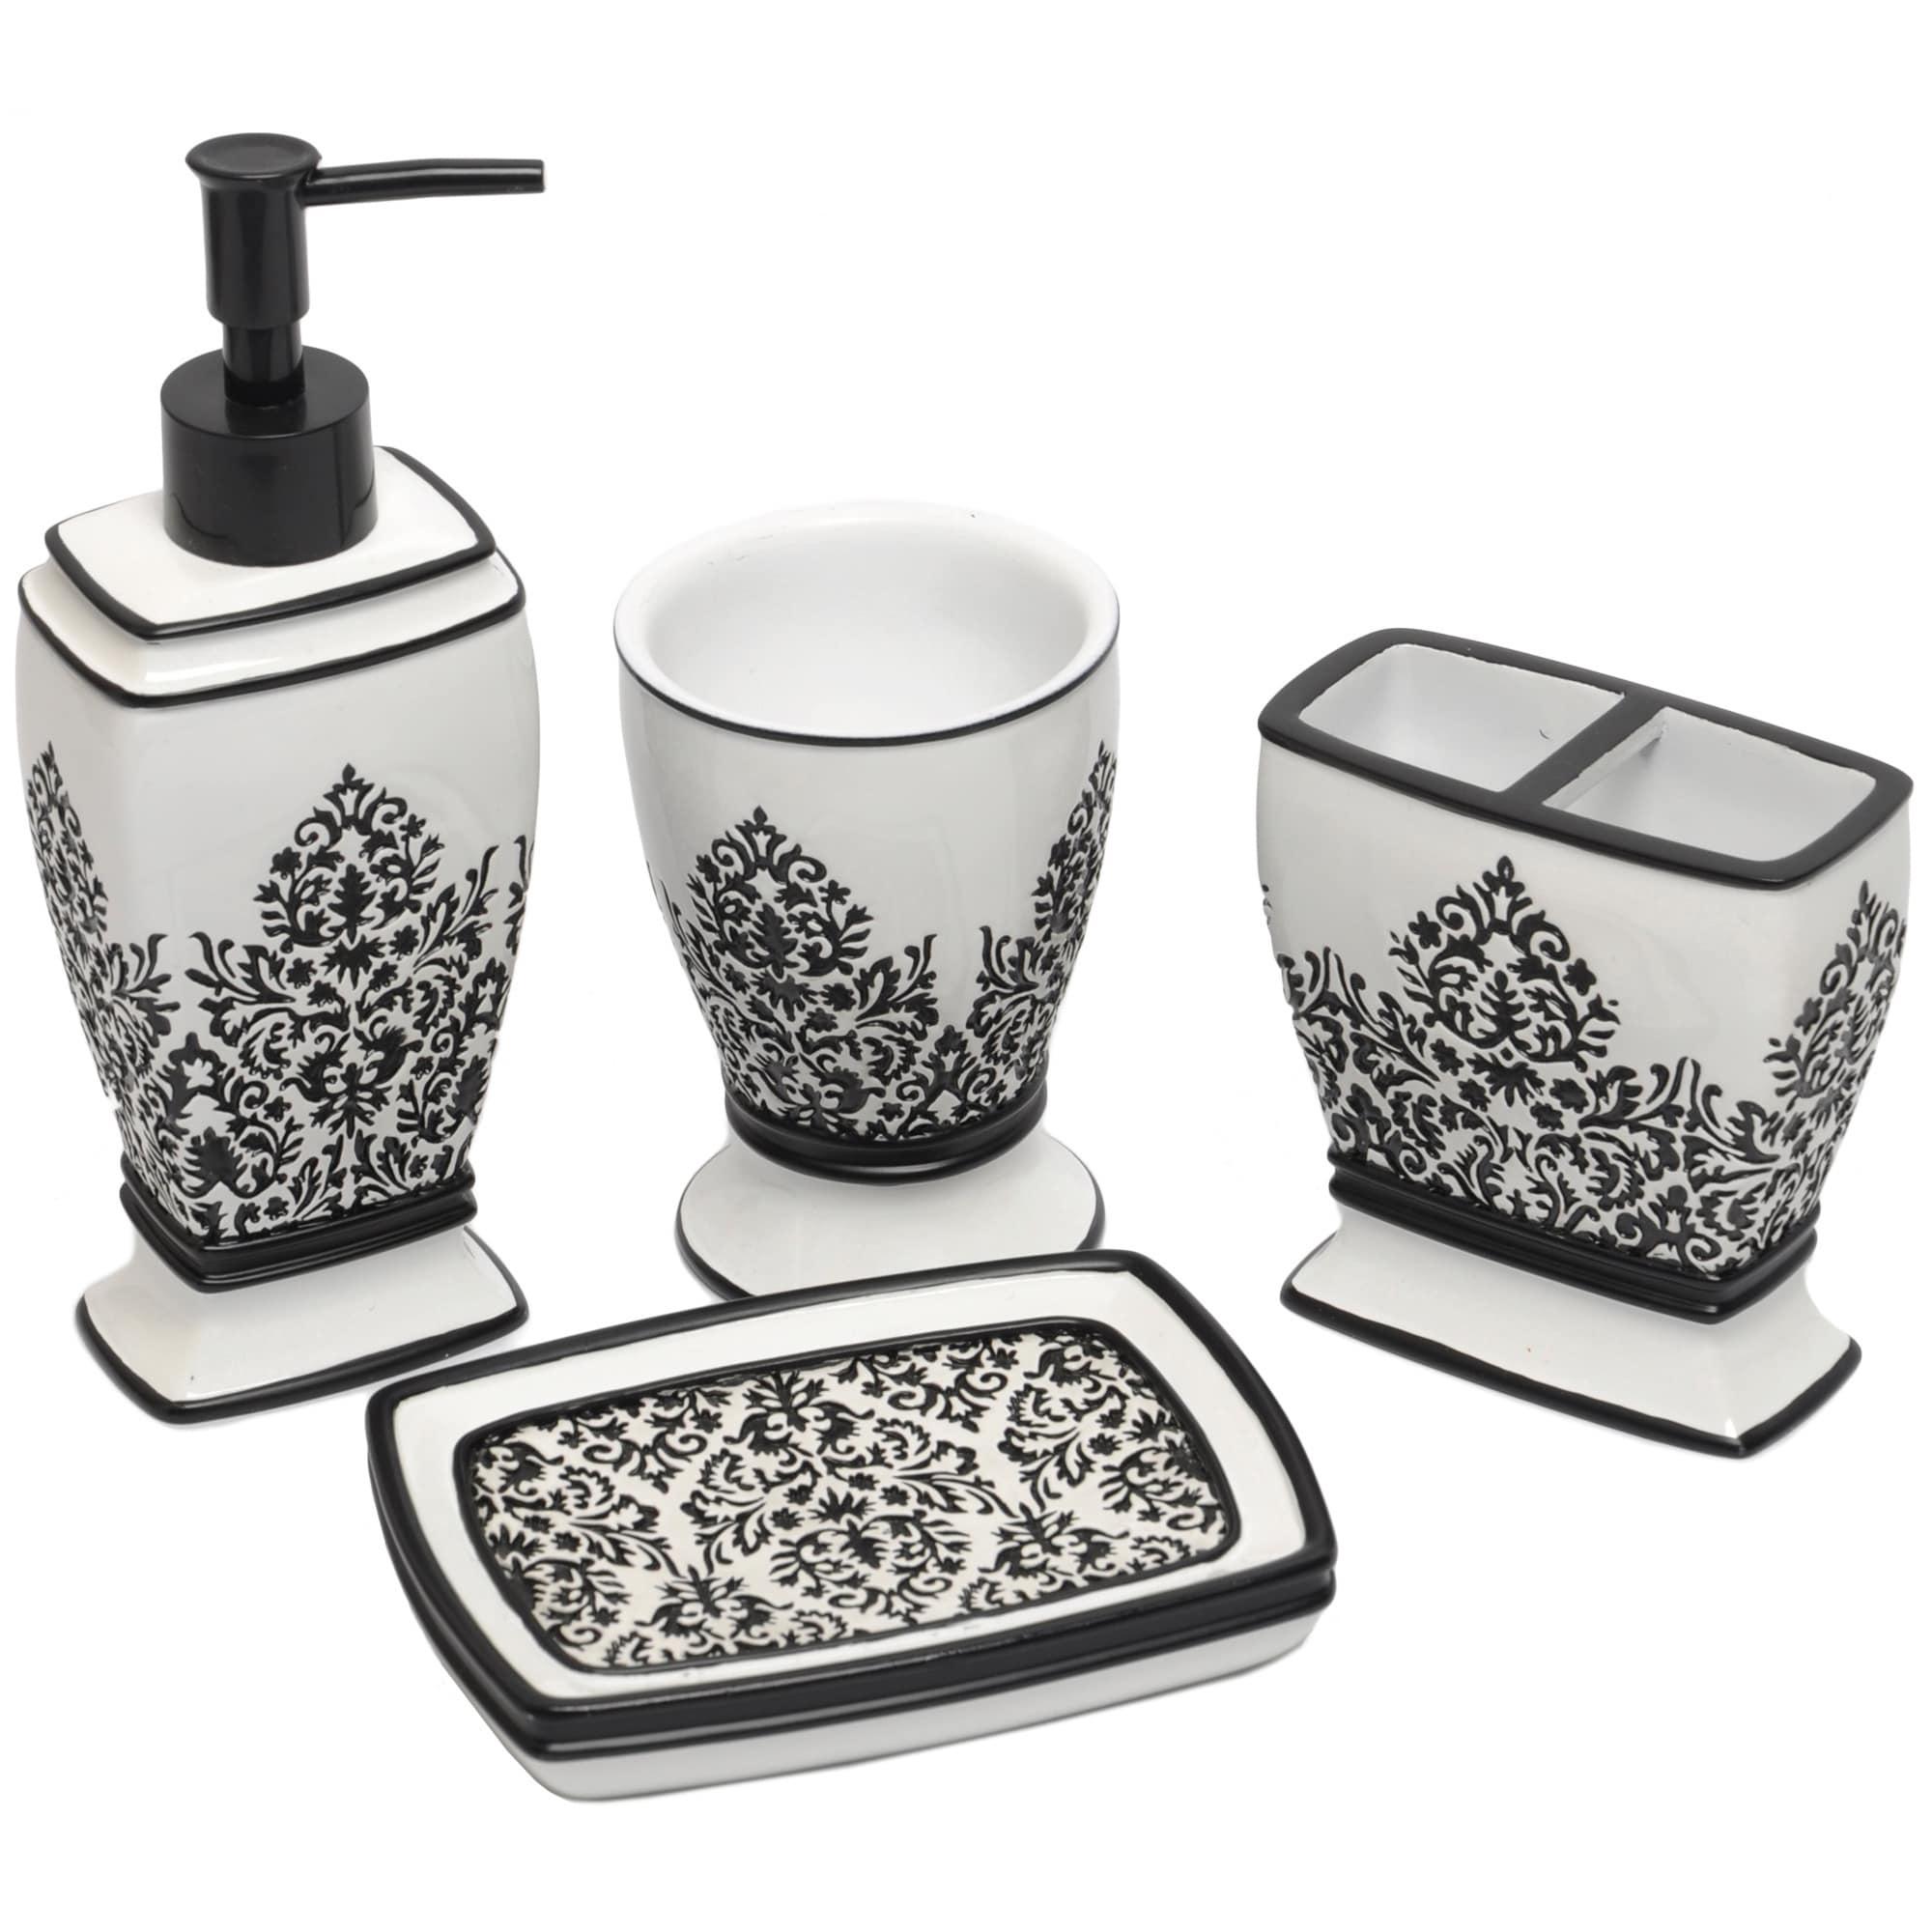 Black/ White Damask Bath Accessory 4-piece Set